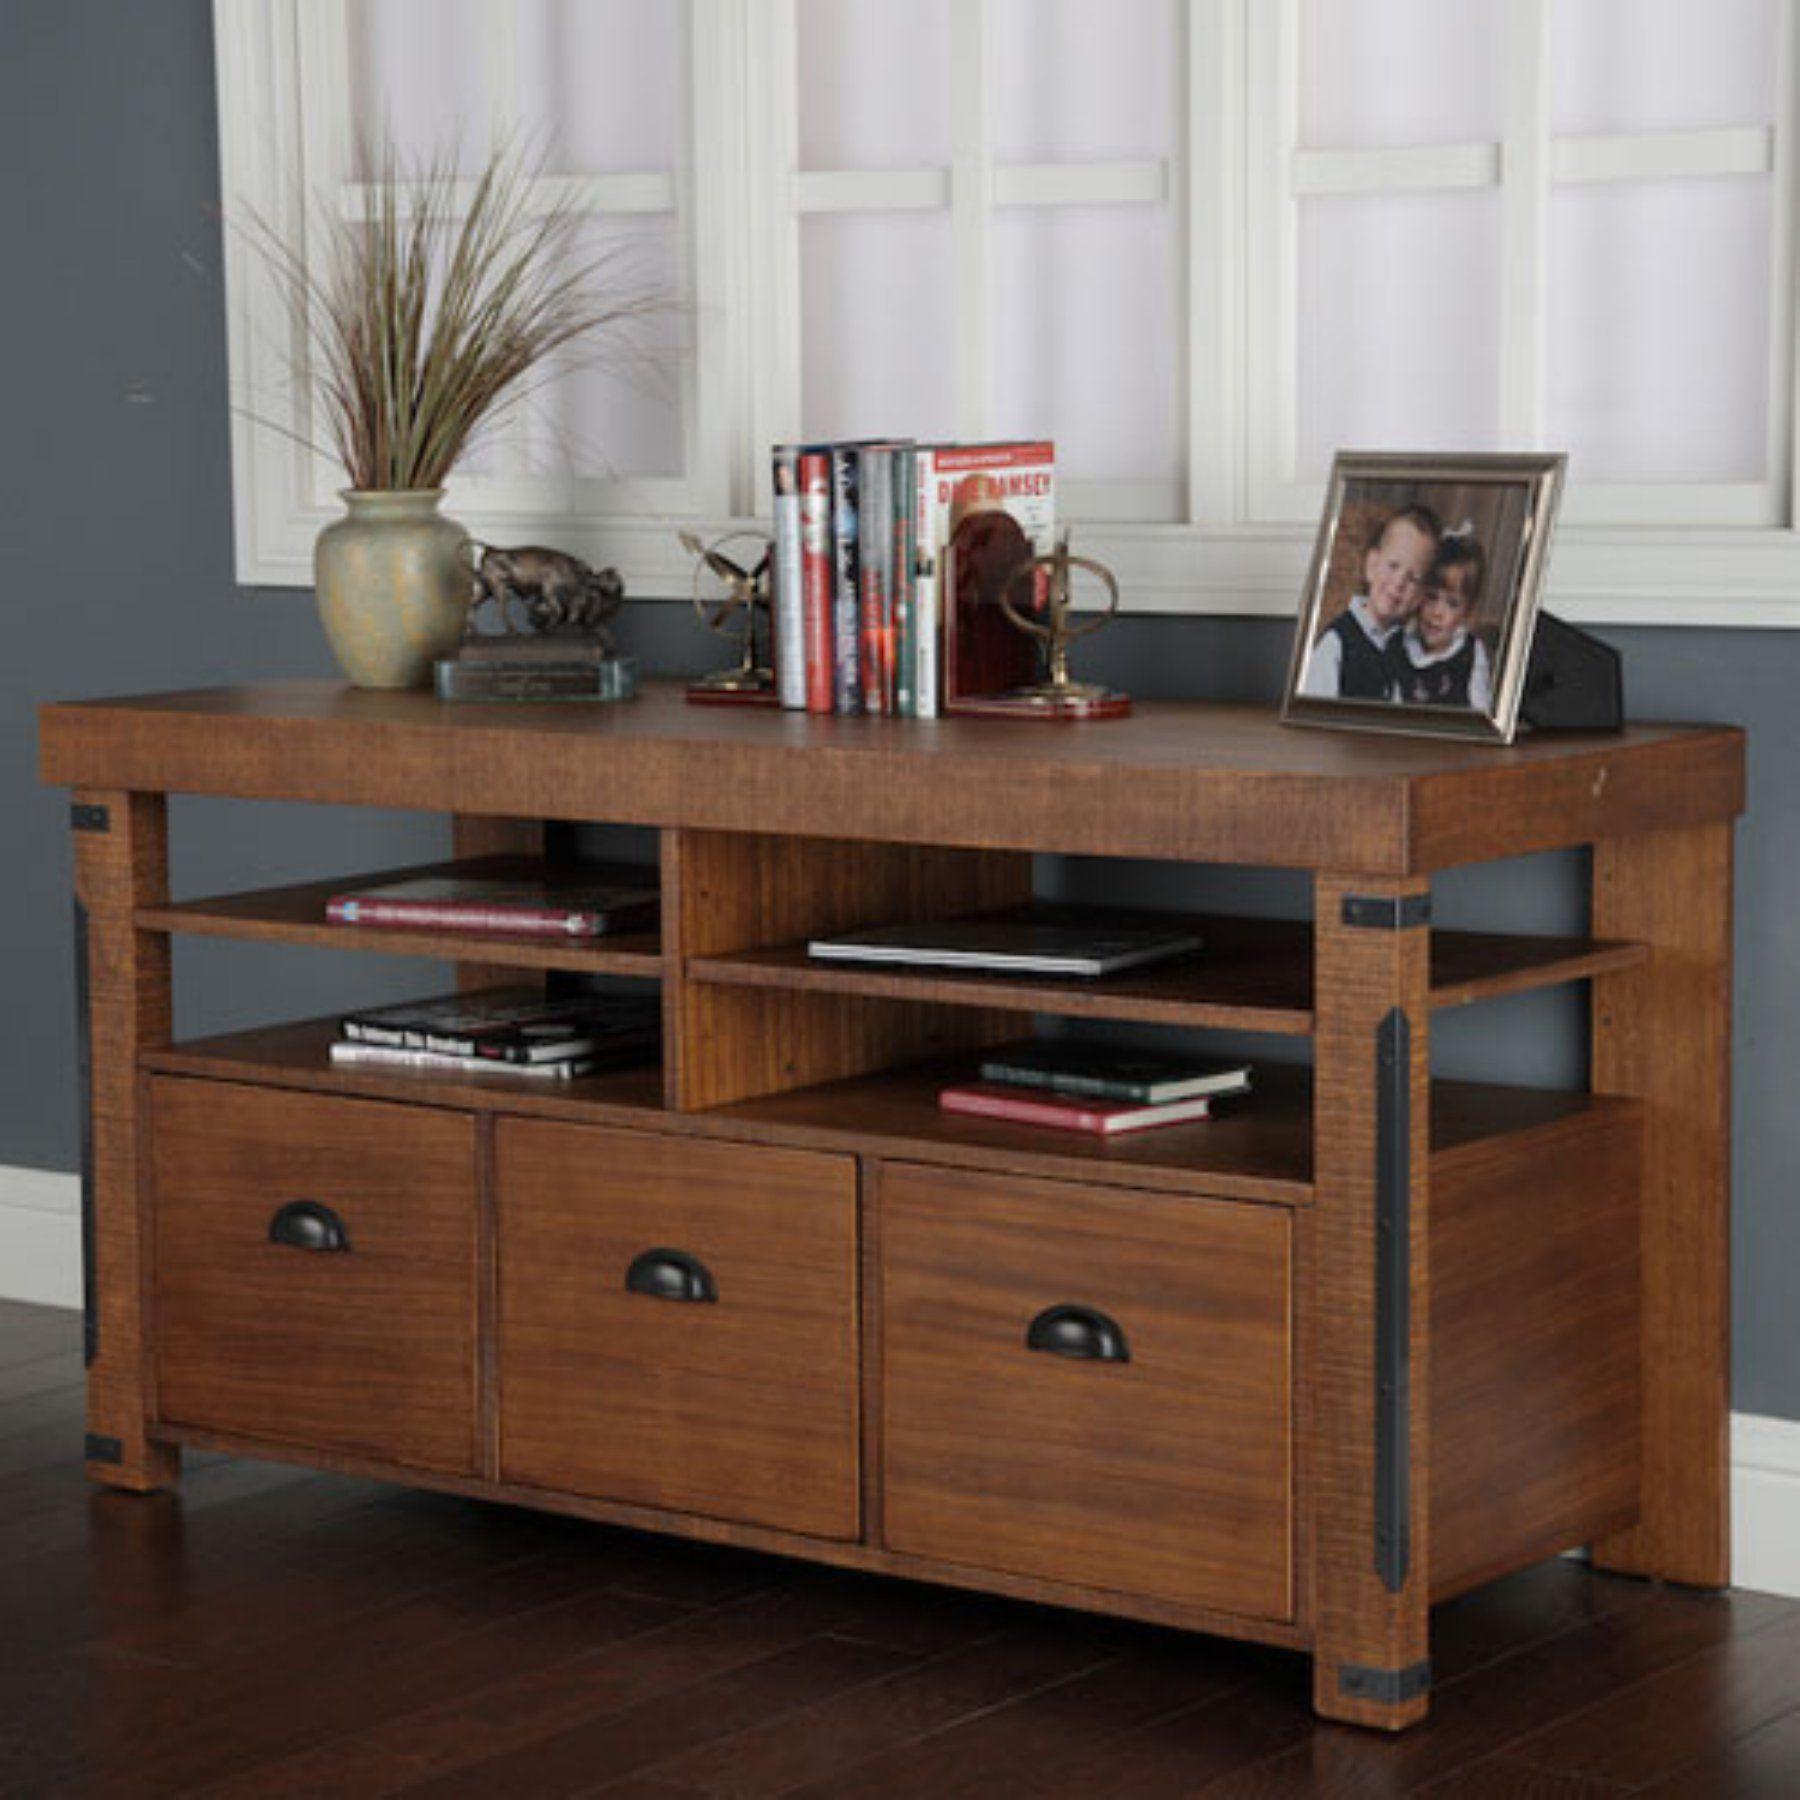 American Furniture Classics Industrial Collection Credenza Console